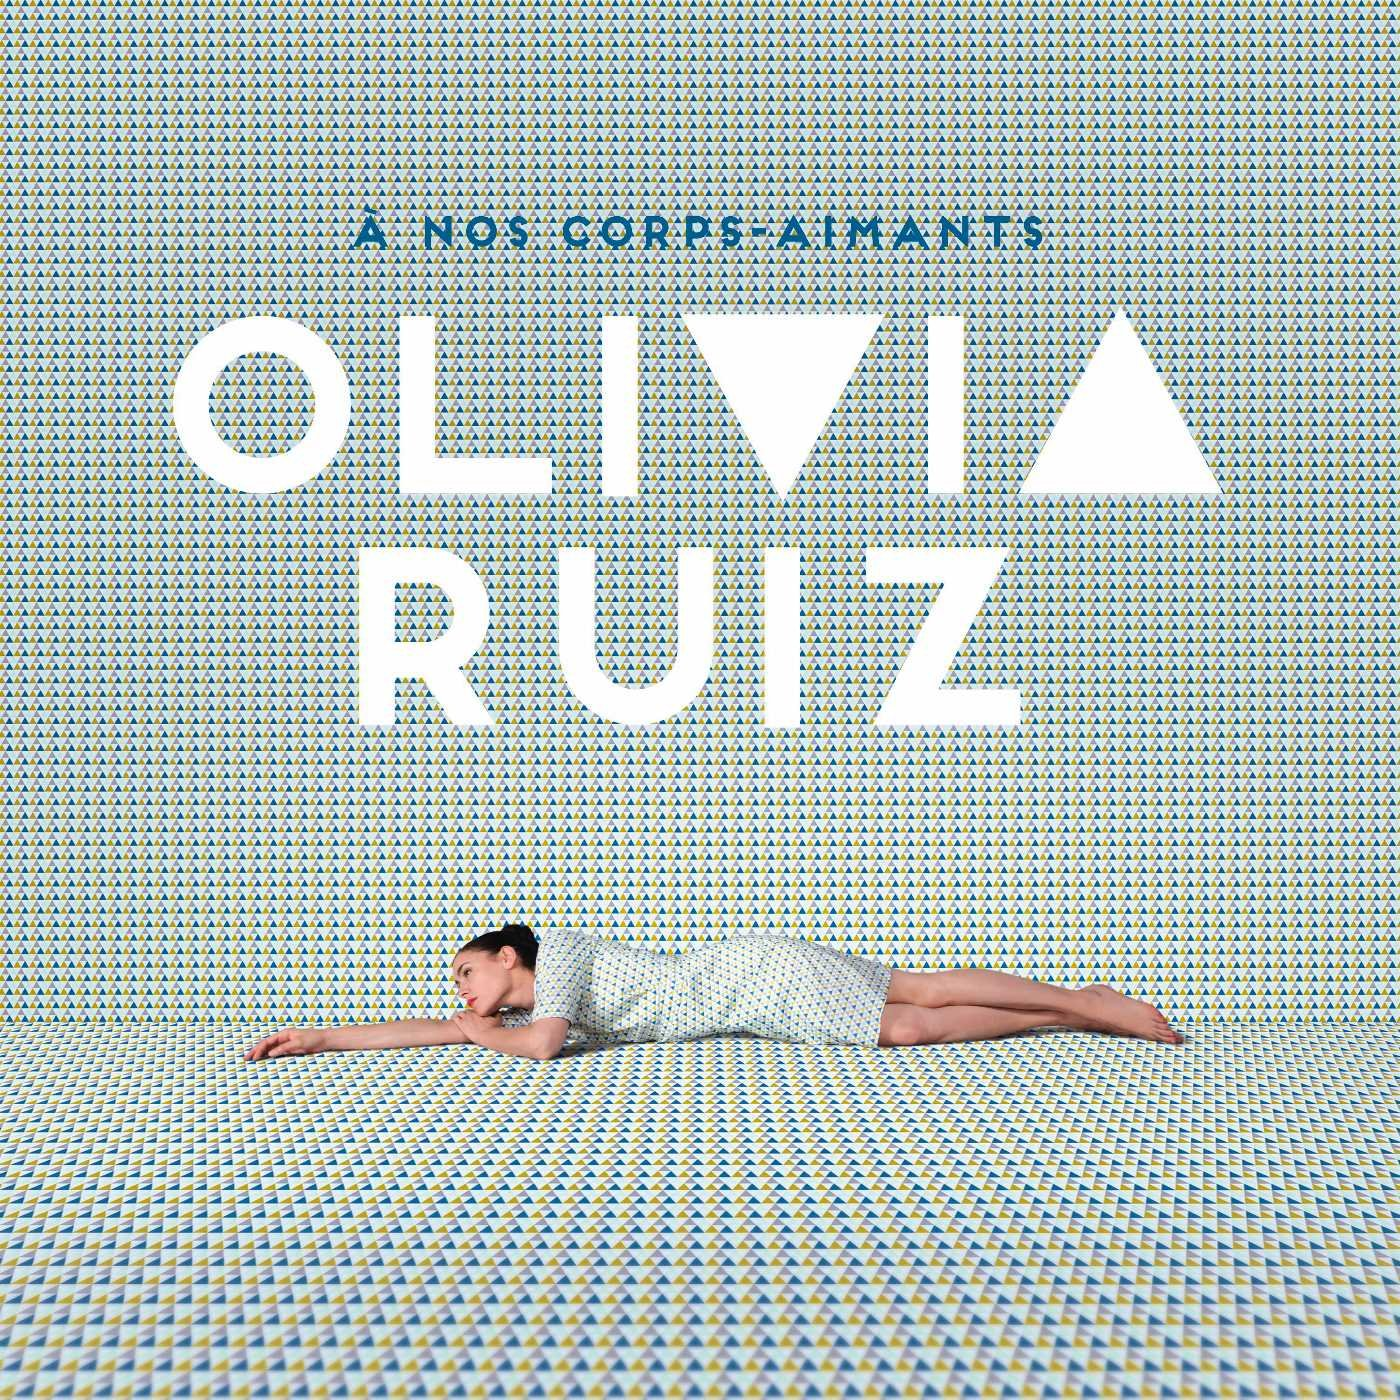 Olivia Ruiz - A nos corps aimants [2016]